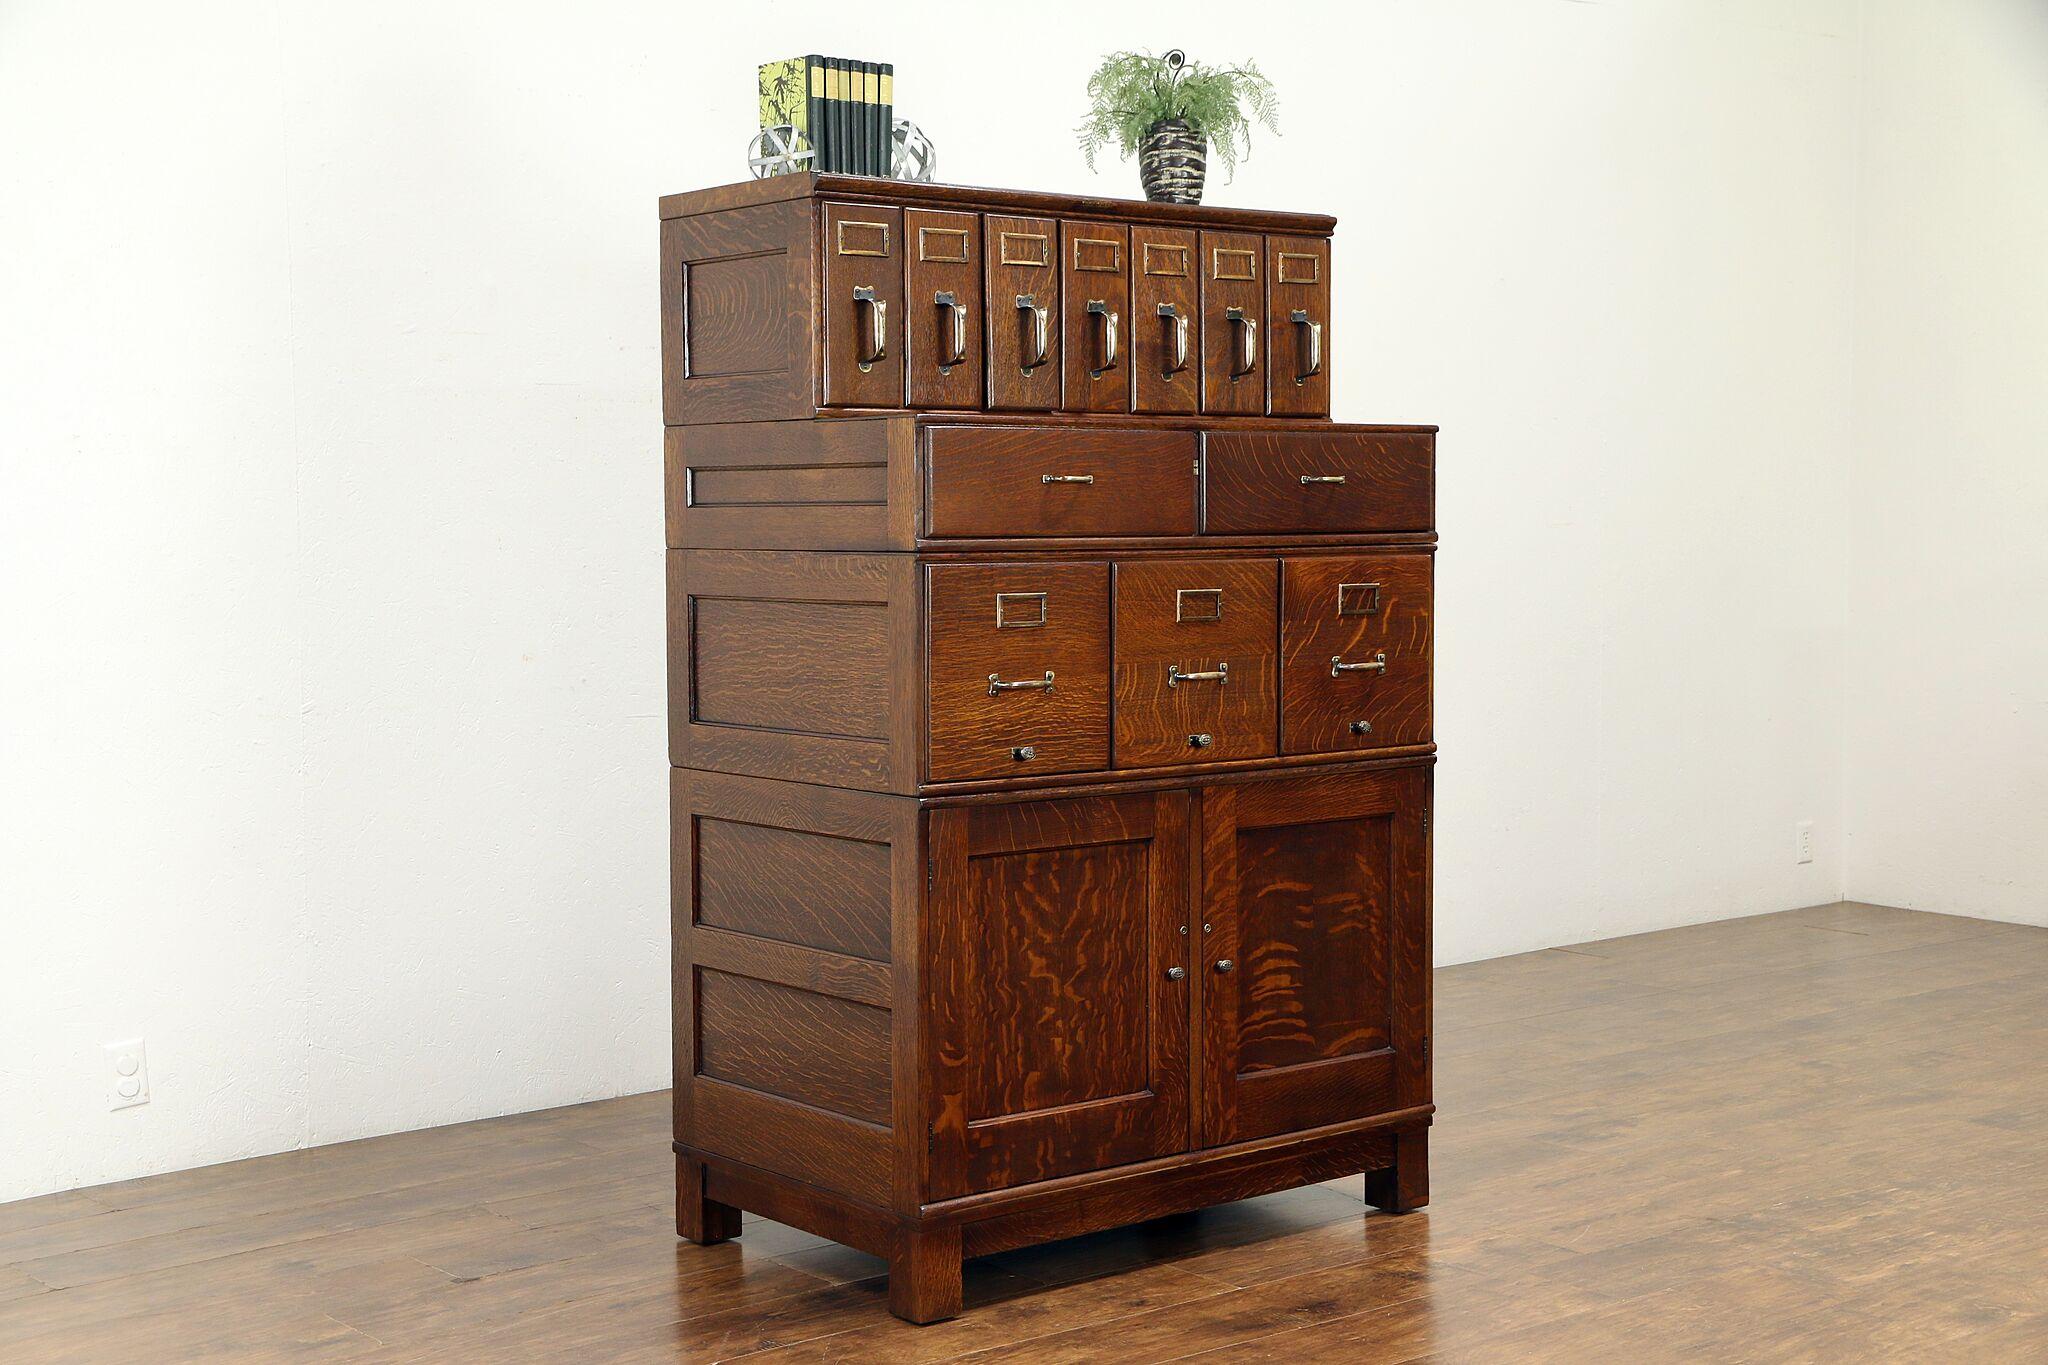 Antique Stacking 12 Drawer File Cabinet